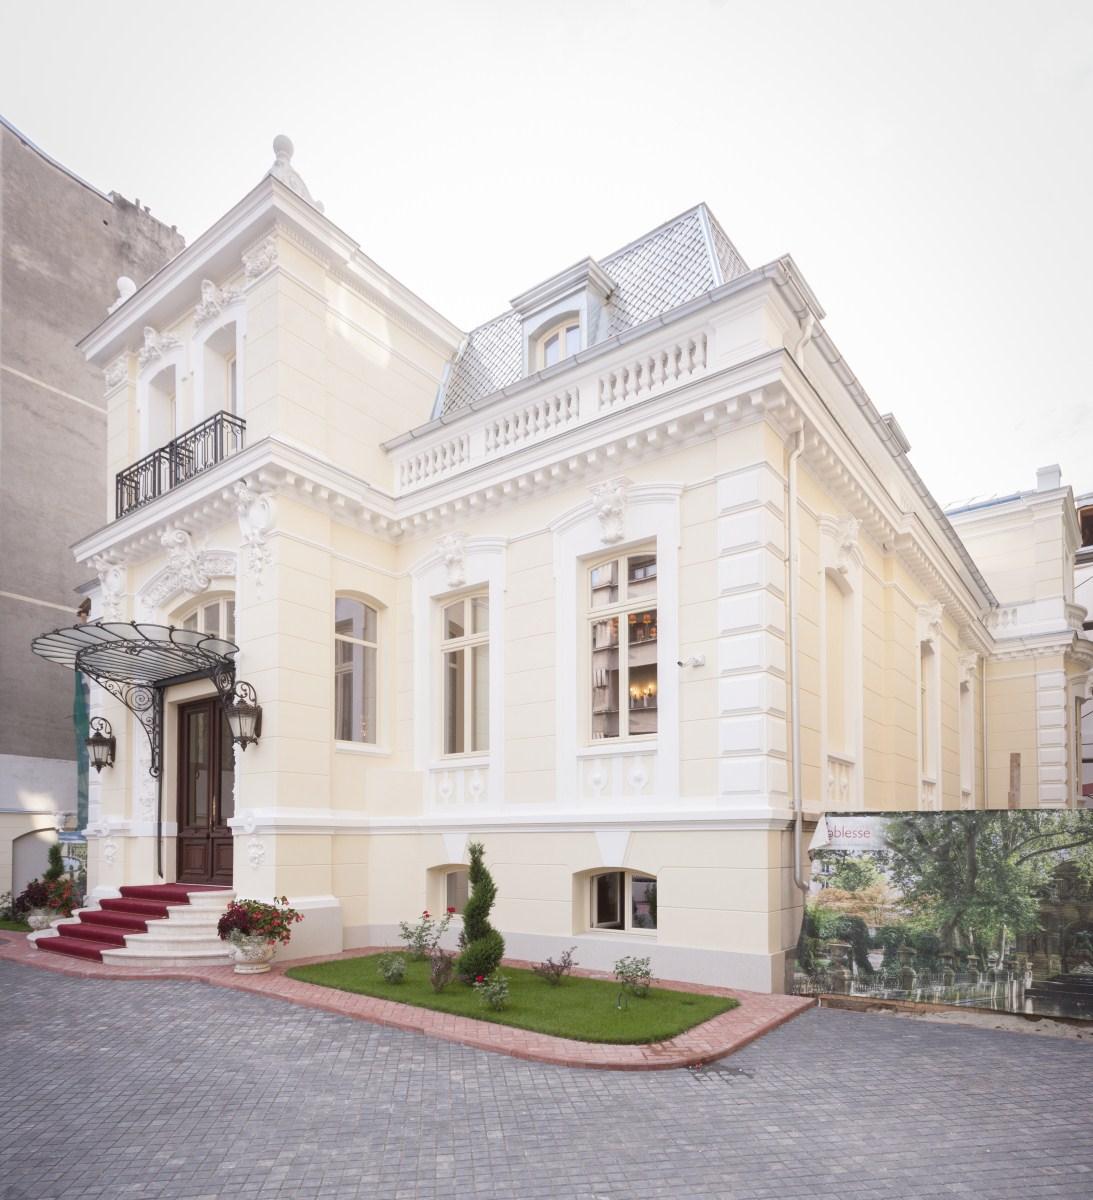 https://nbc-arhitect.ro/wp-content/uploads/2020/10/NBC-Arhitect-_-restorations-_-Sfintilor-House-_-Romania_7.jpg